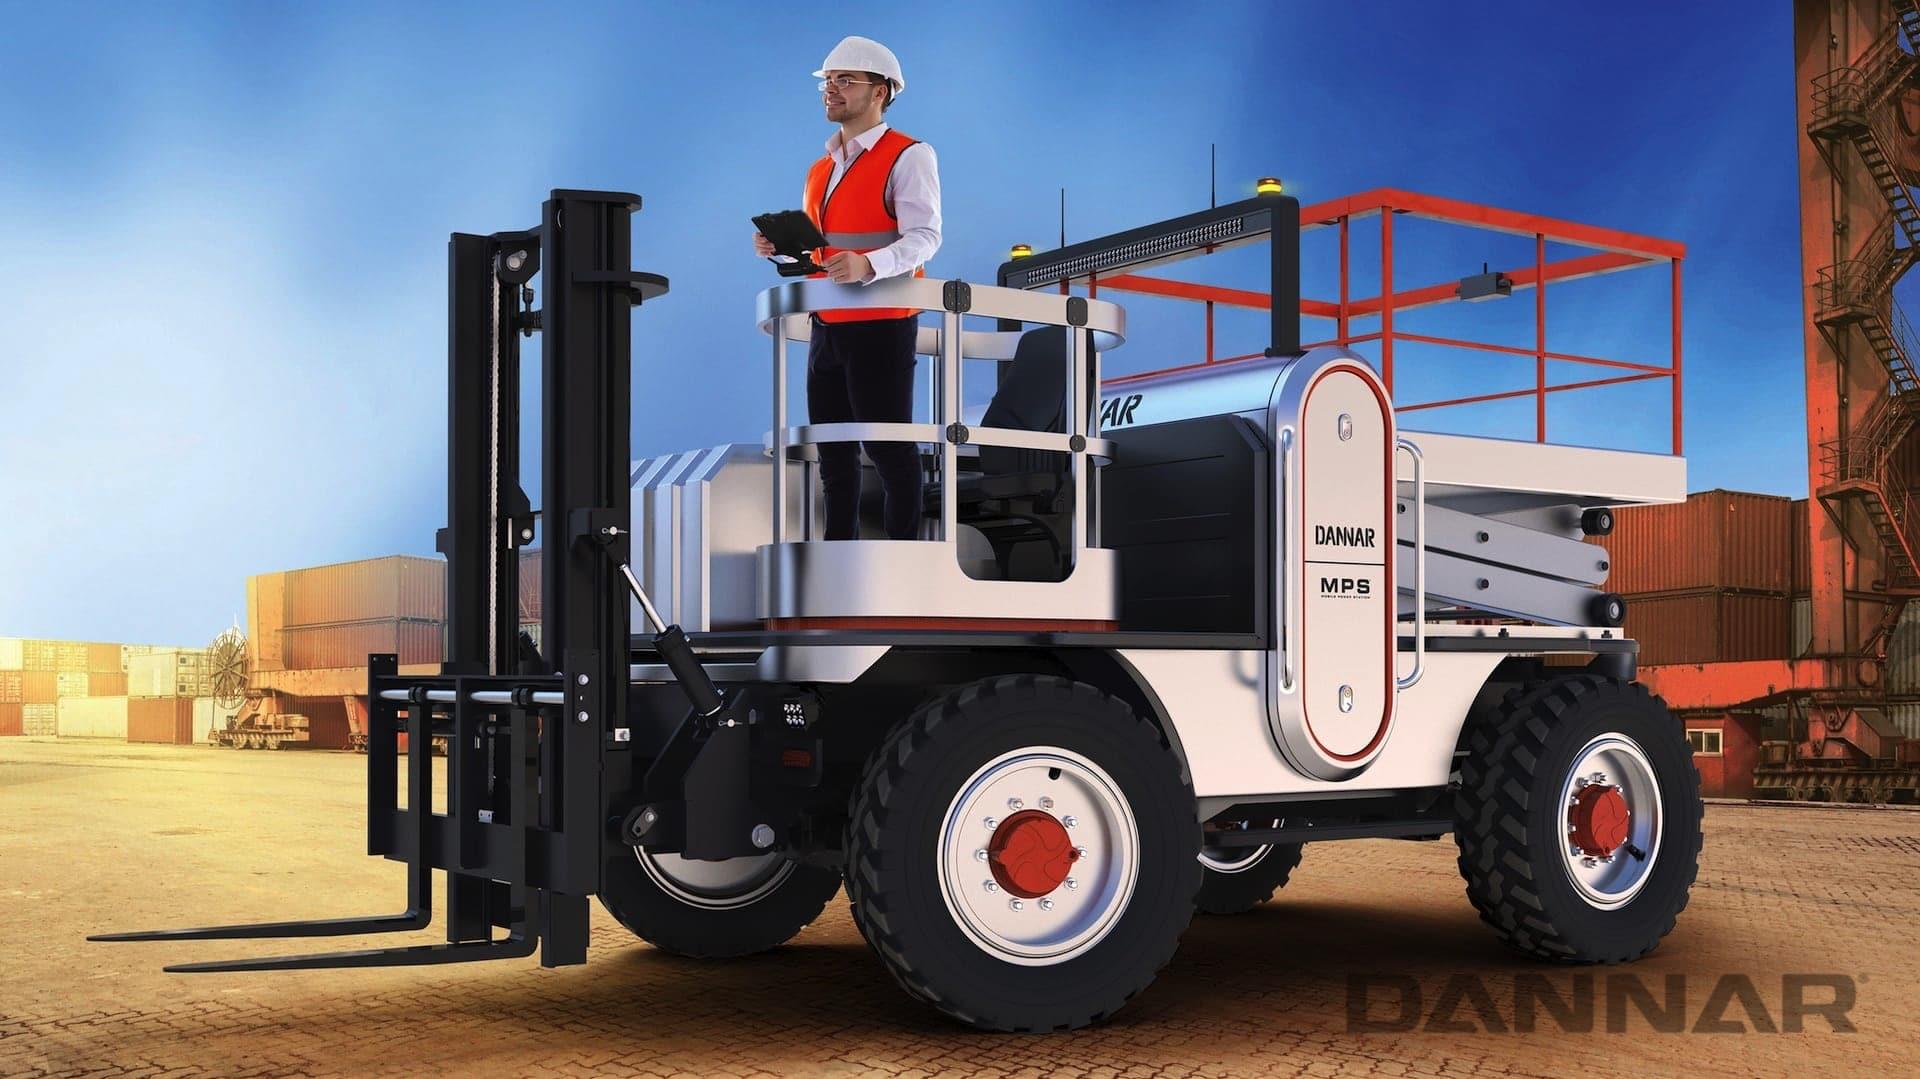 DANNAR MPS 400 Revolutionary Work Vehicle Ports